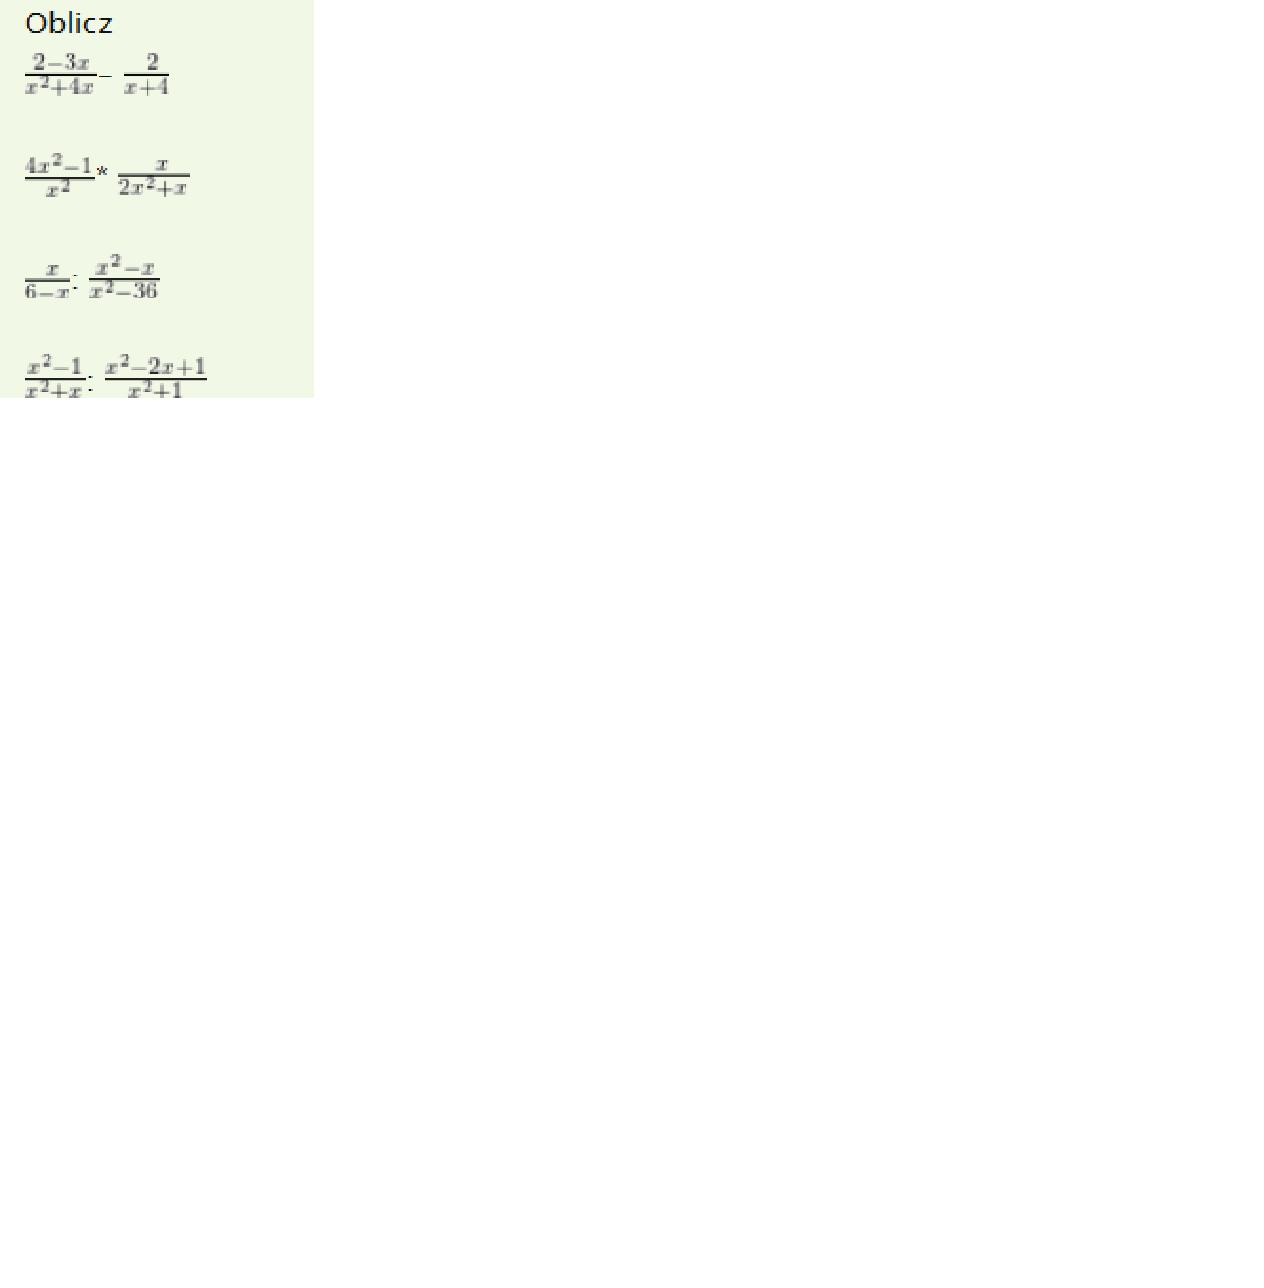 zadanie.png PlusPng.com  - Zadanie PNG